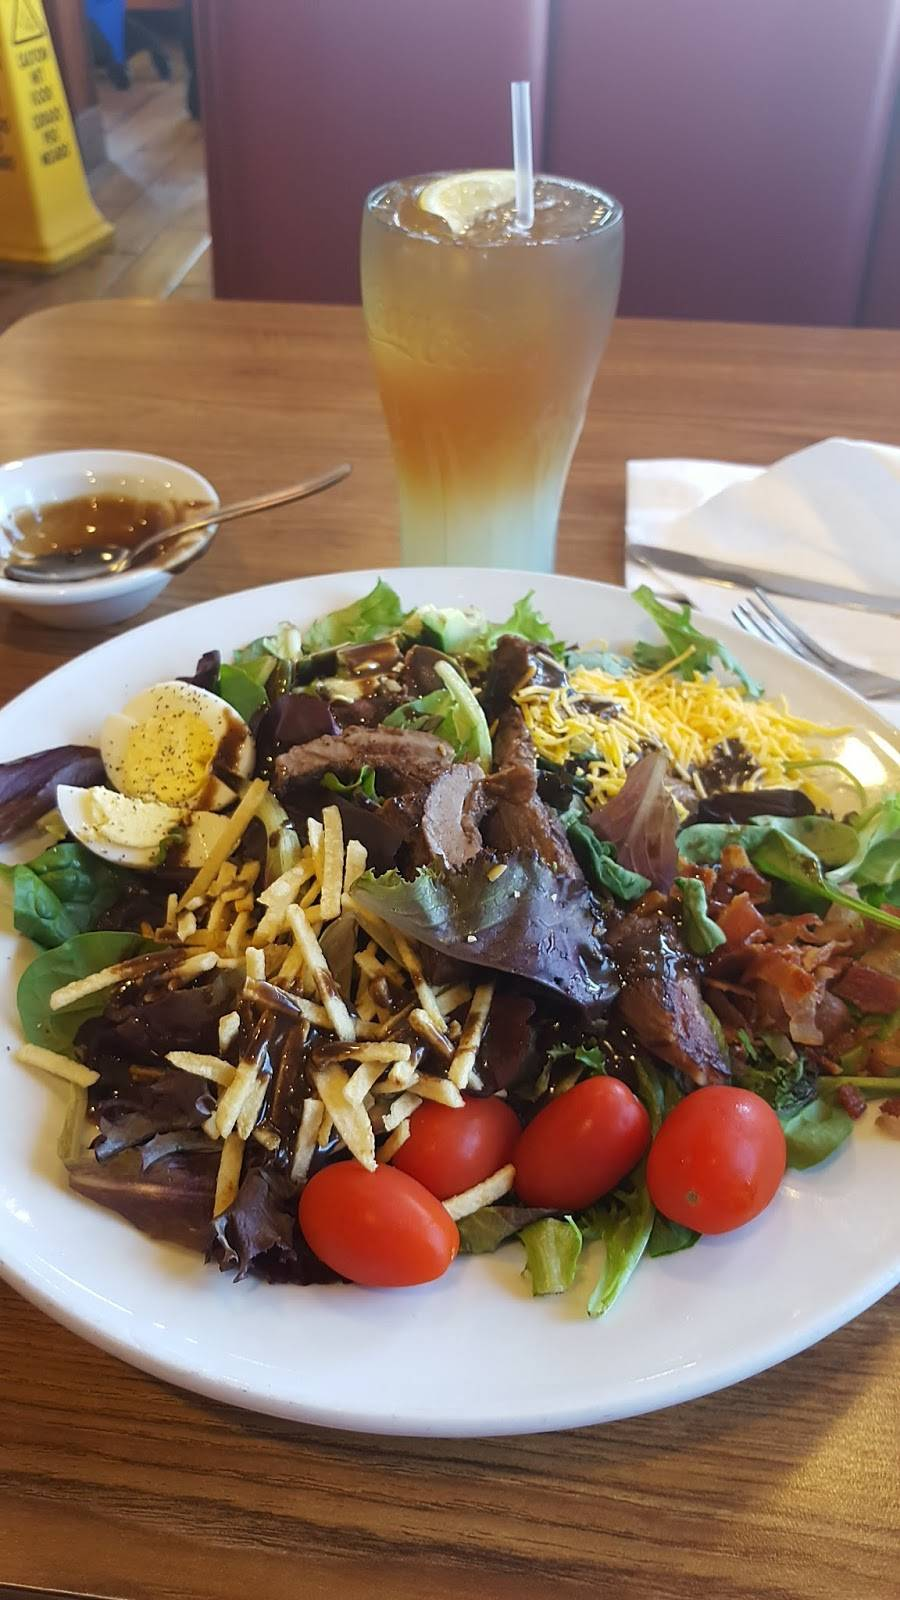 Dennys | restaurant | 1041 Truman St, San Fernando, CA 91340, USA | 8183653048 OR +1 818-365-3048